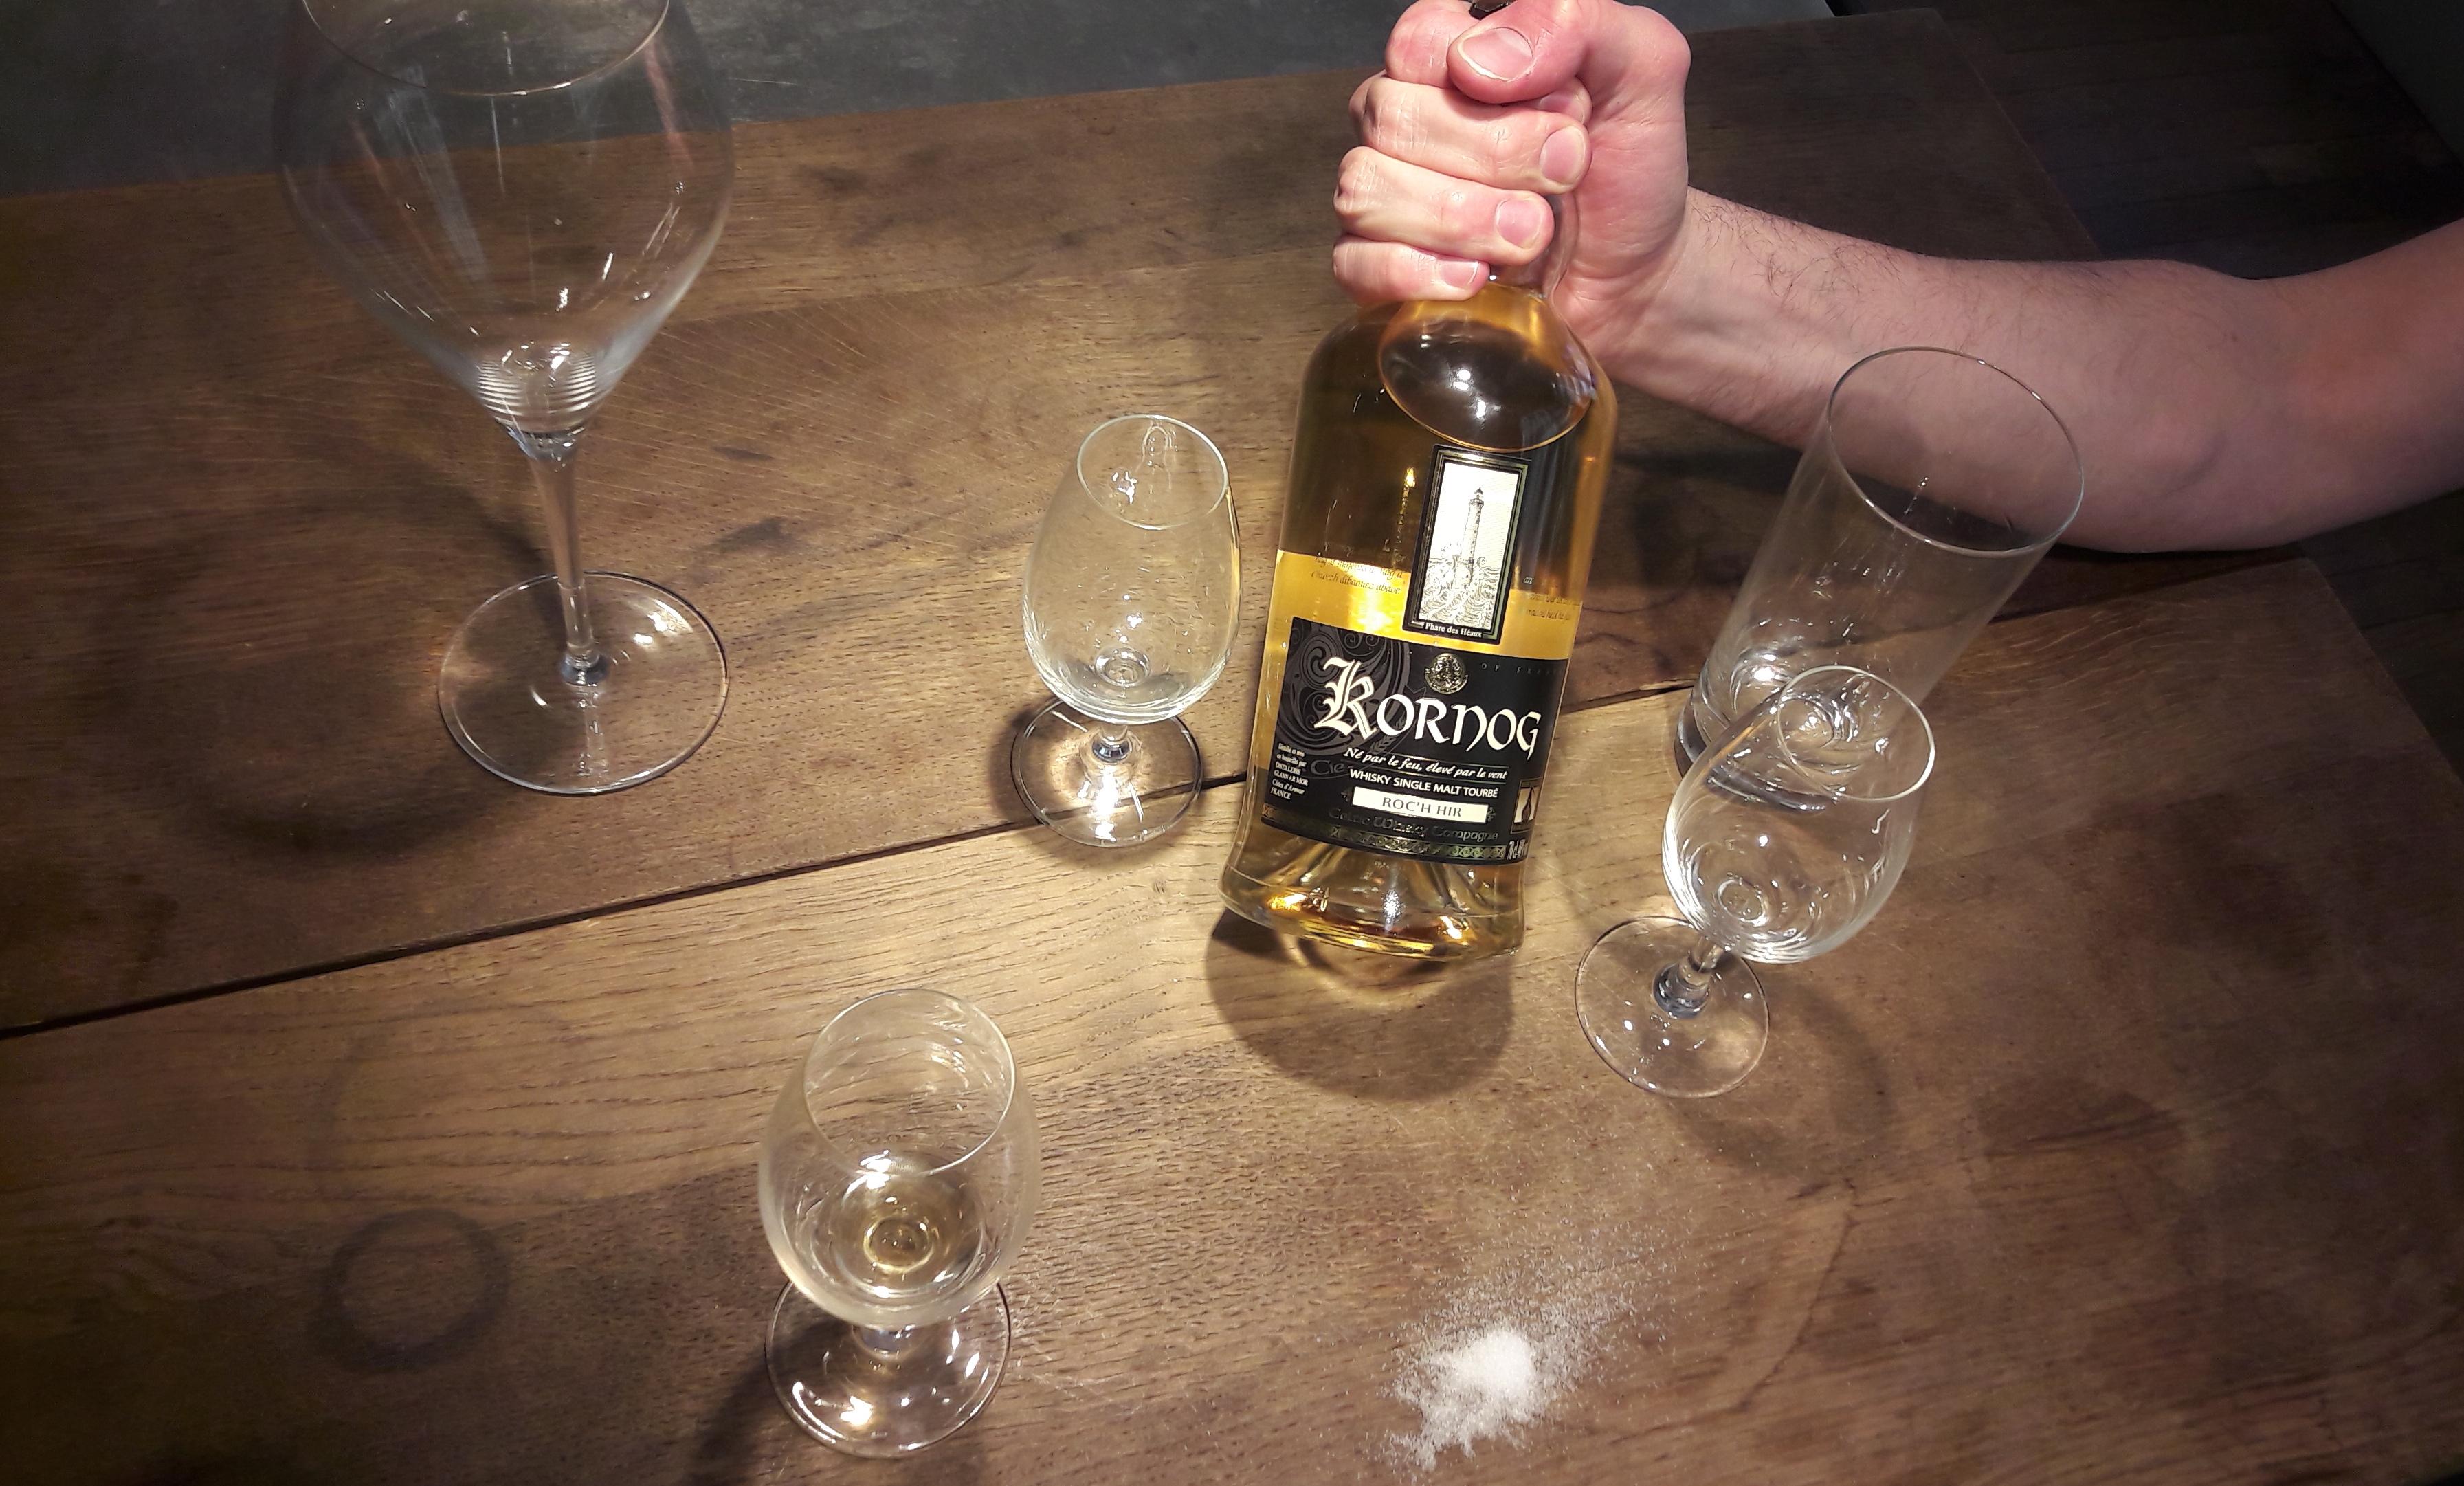 Whisky Français, Single Cask, Single Malt, Glann Ar Mor, Kornog, Roc'h Hir, Sant Ivy, Saint Erwan, Maris Otter Barley, tourbe, iode